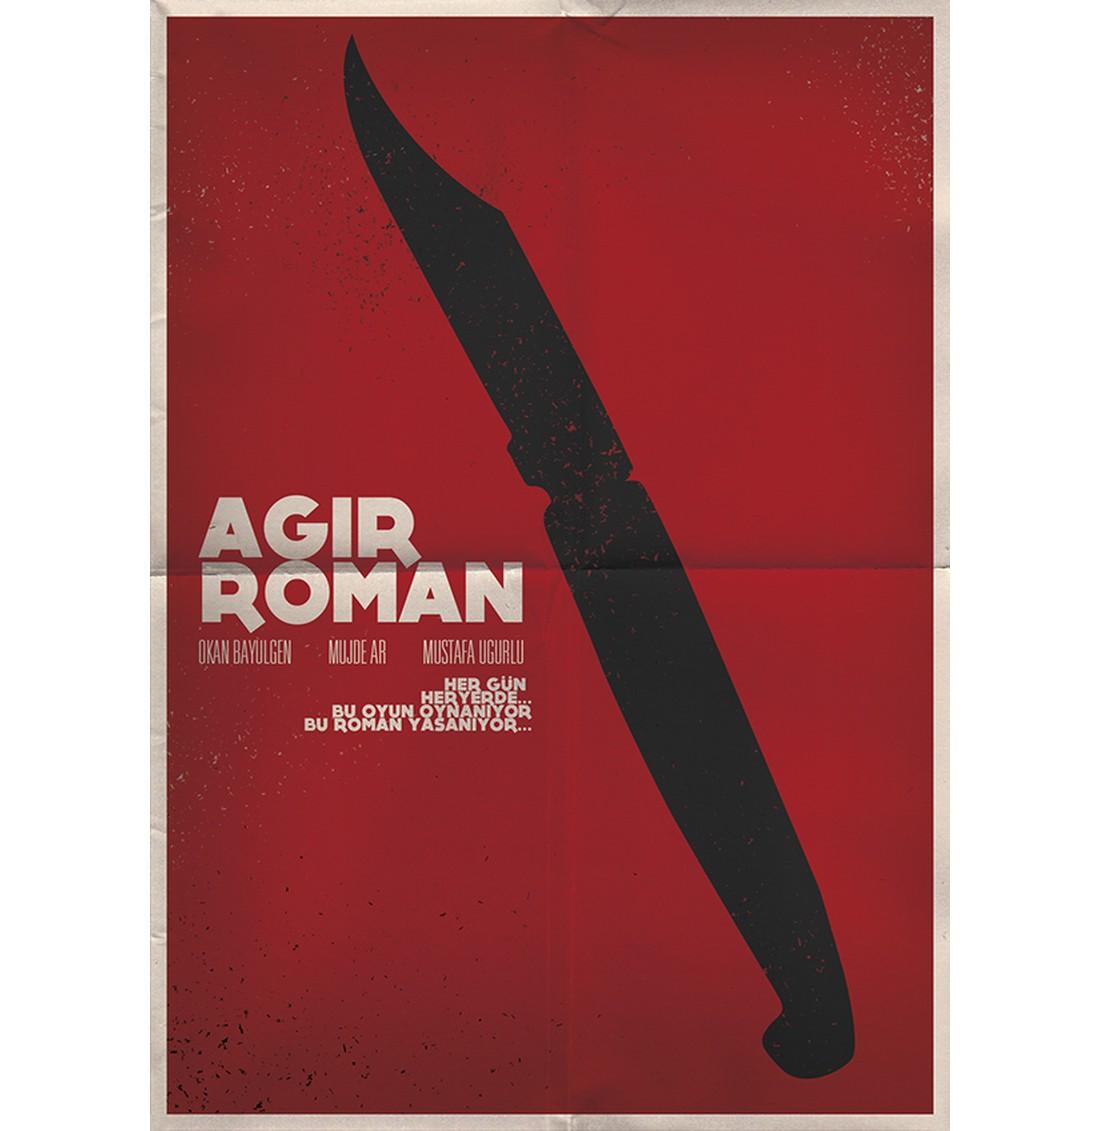 agir roman poster